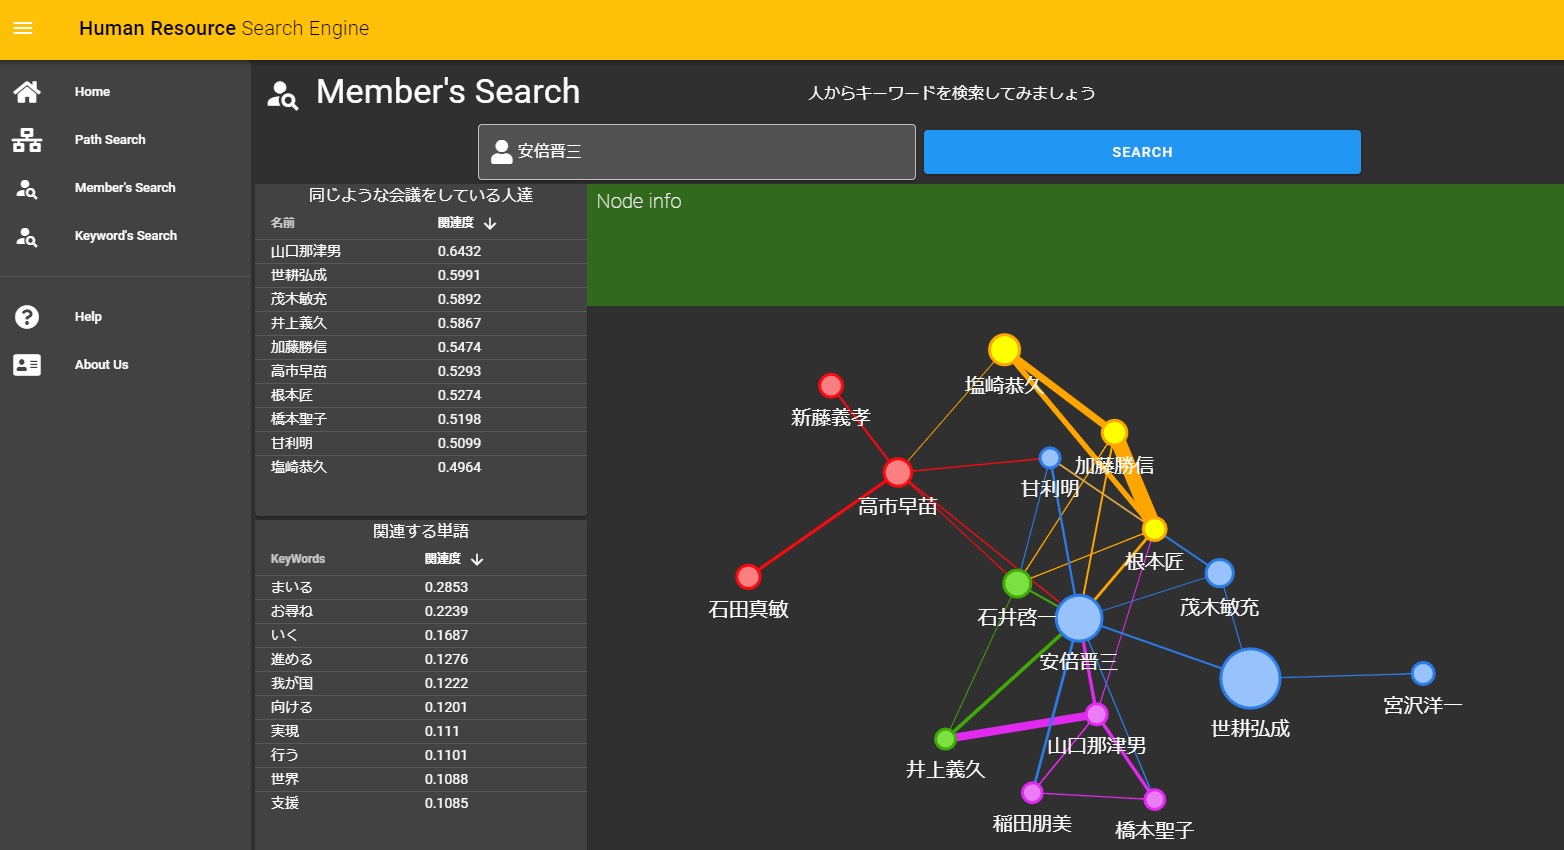 membersearch-min.png